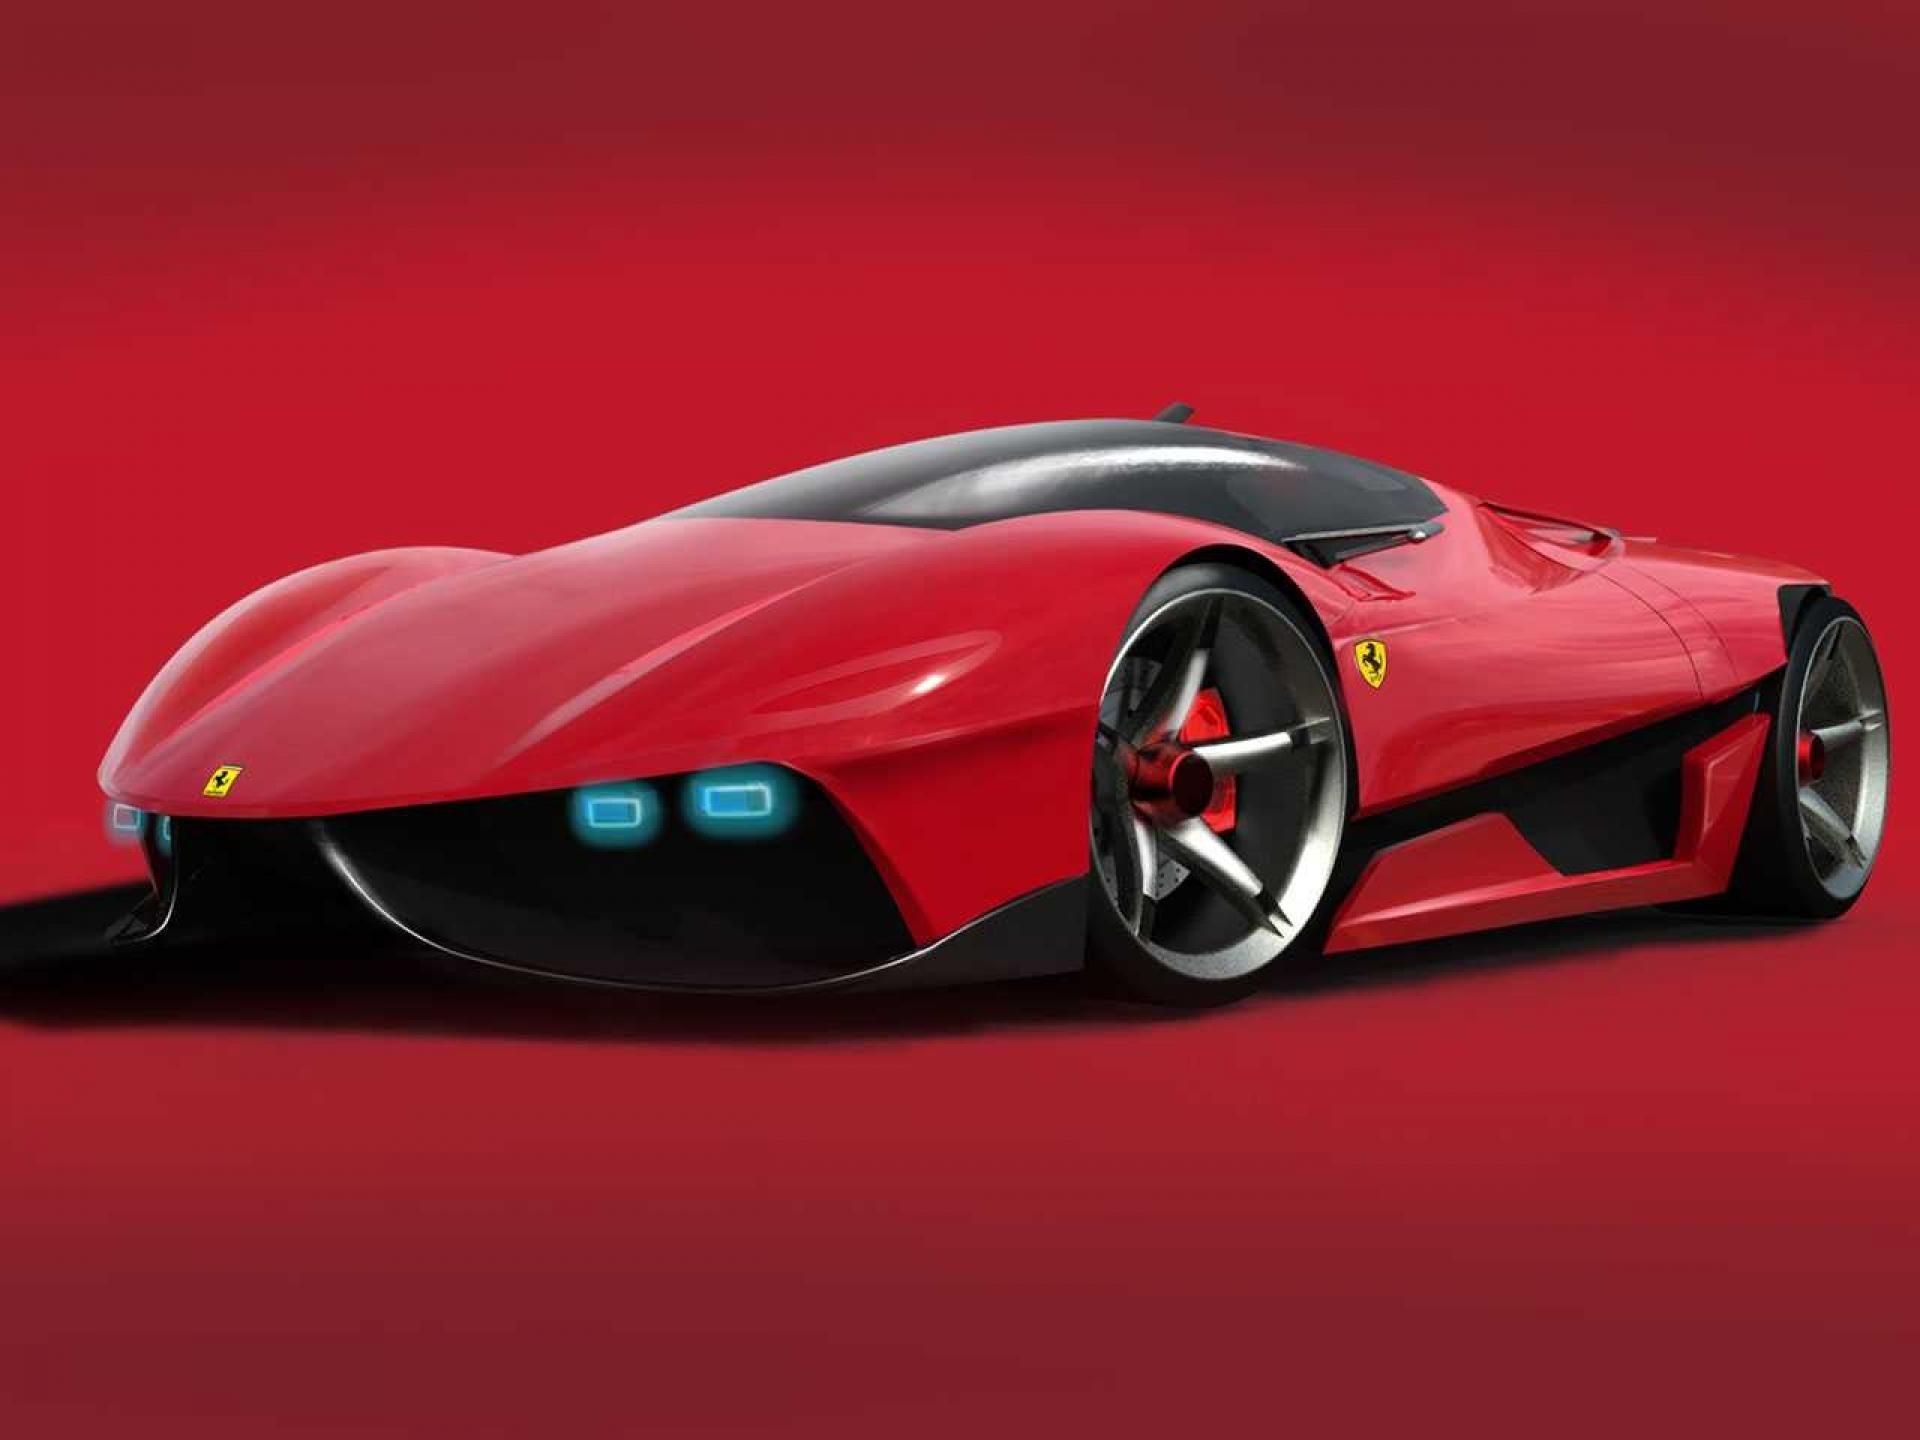 Latest Futuristic Ferrari Car Download Wallpaper Car Pics Pin Hd